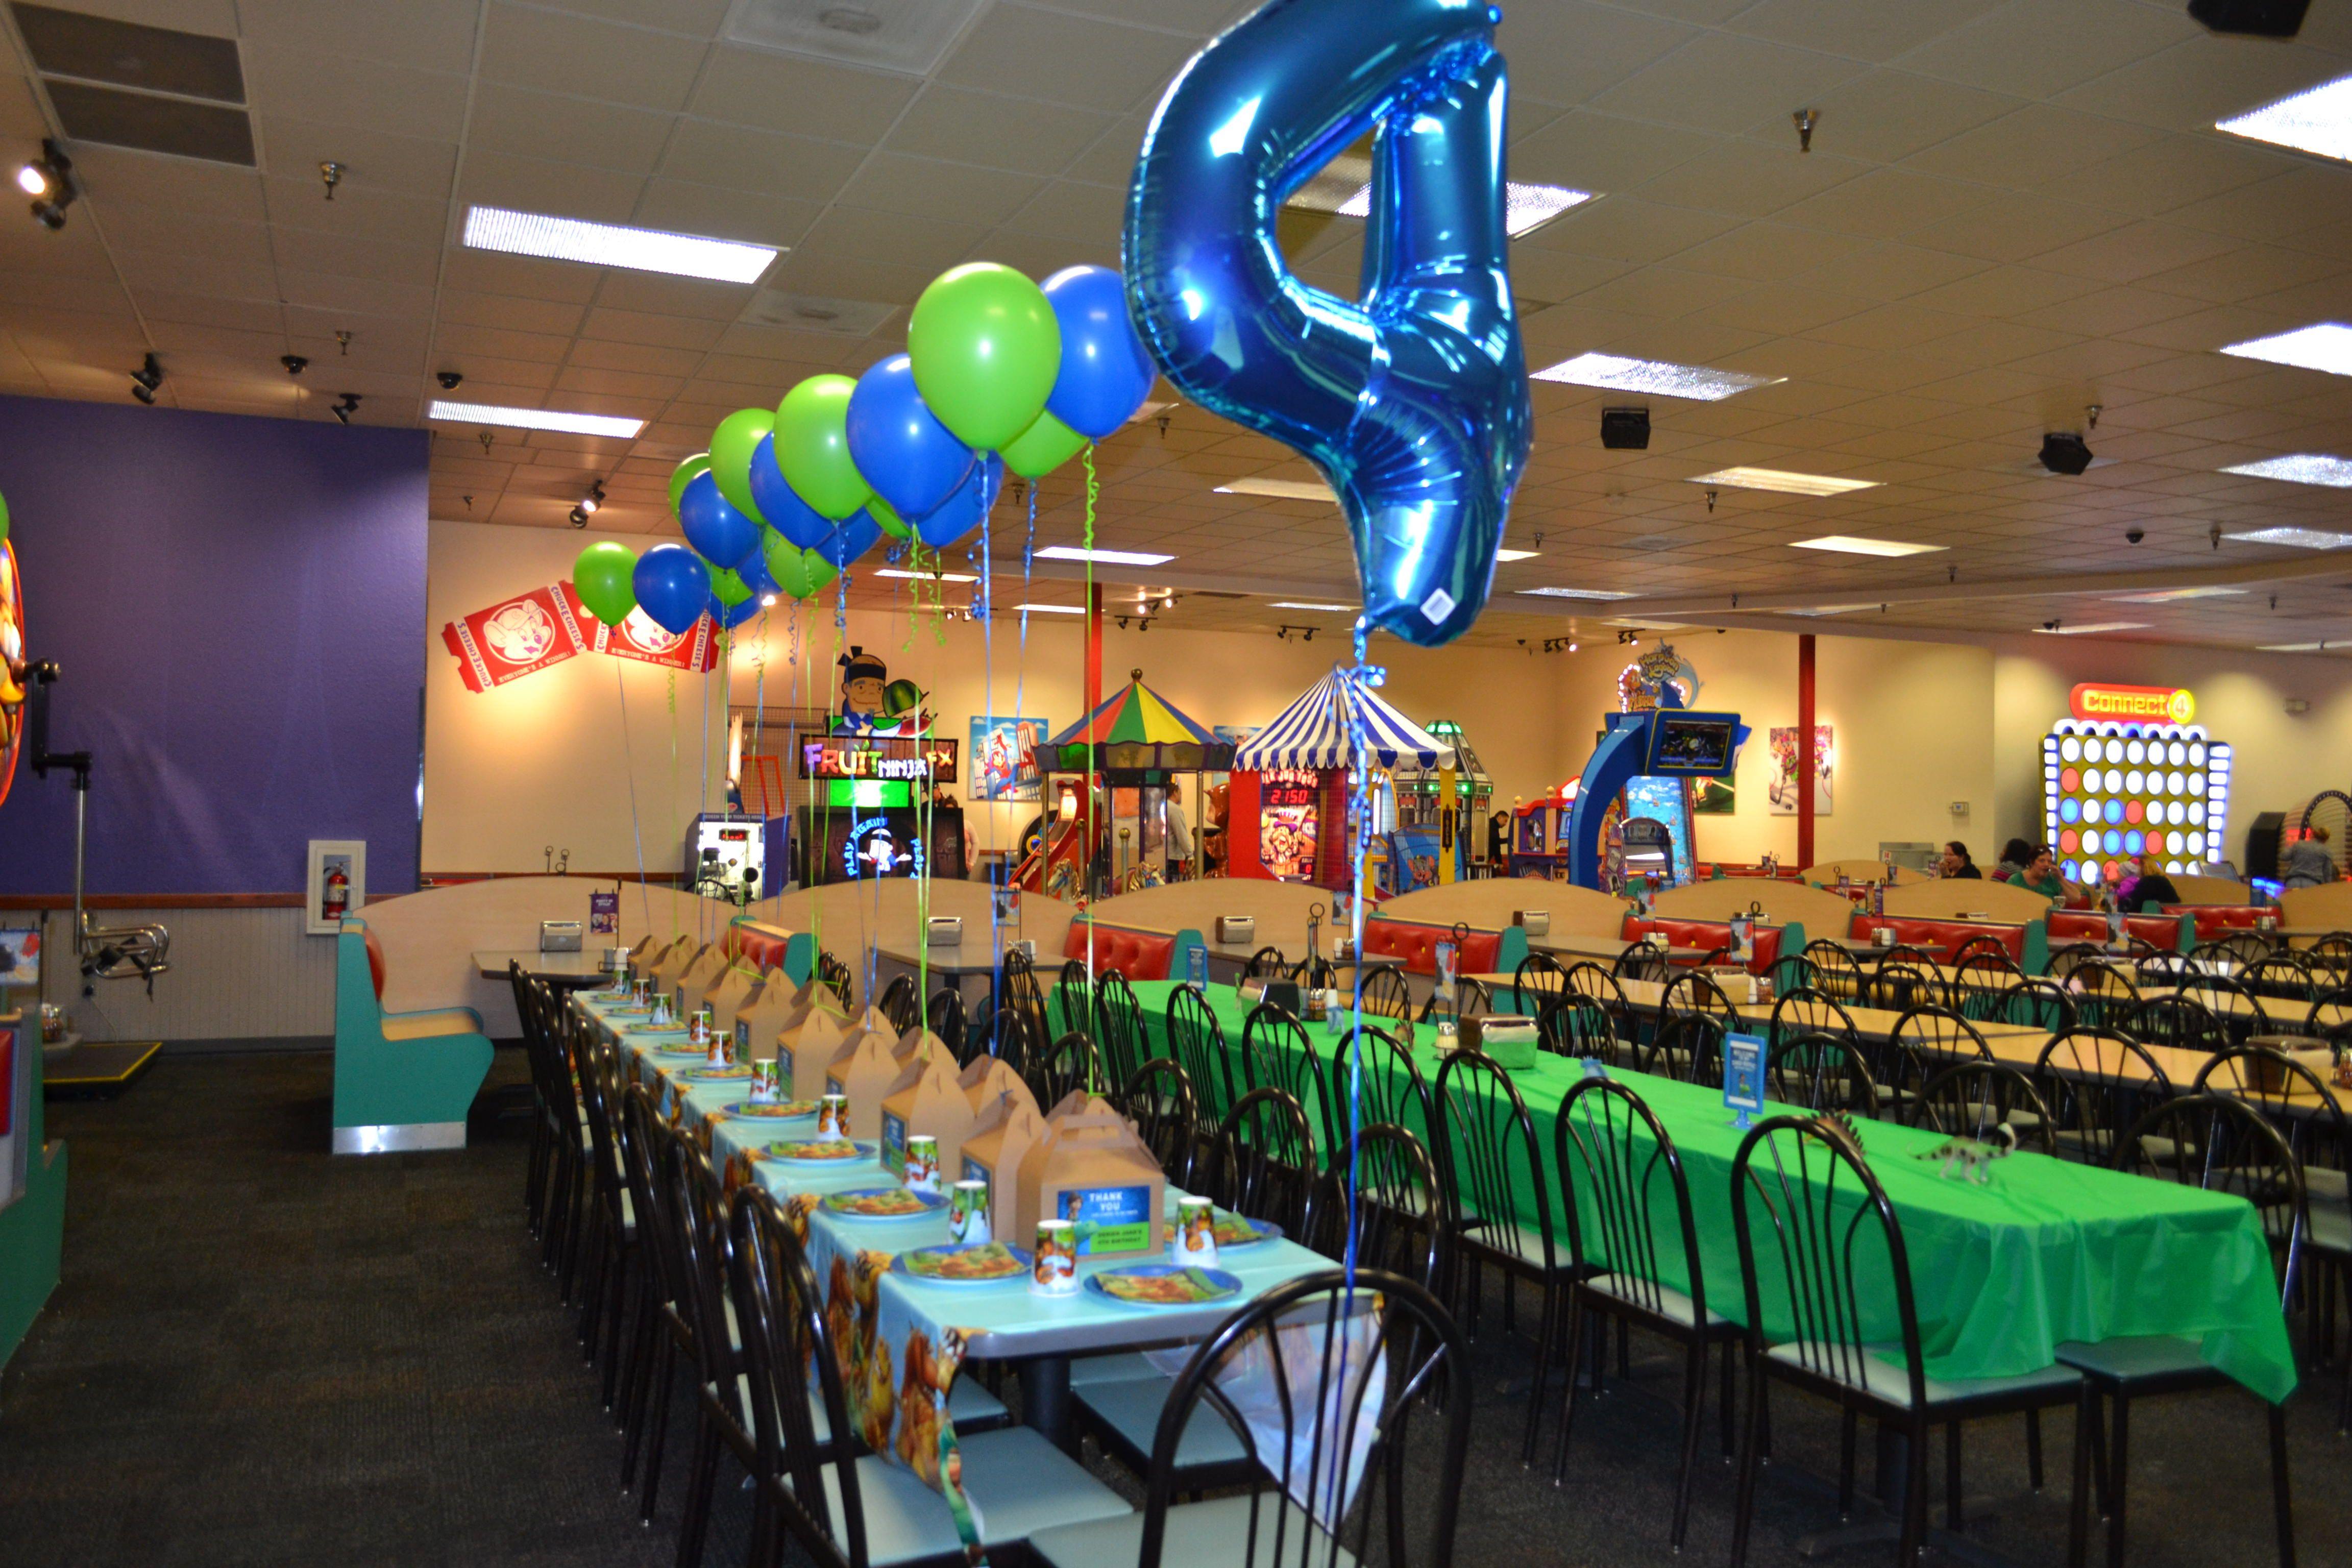 Dj S 4th Birthday Chuck E Cheese Party The Good Dinosaur Theme Chucky Cheese Birthday Party Monster Jam Birthday Party Pokemon Birthday Party